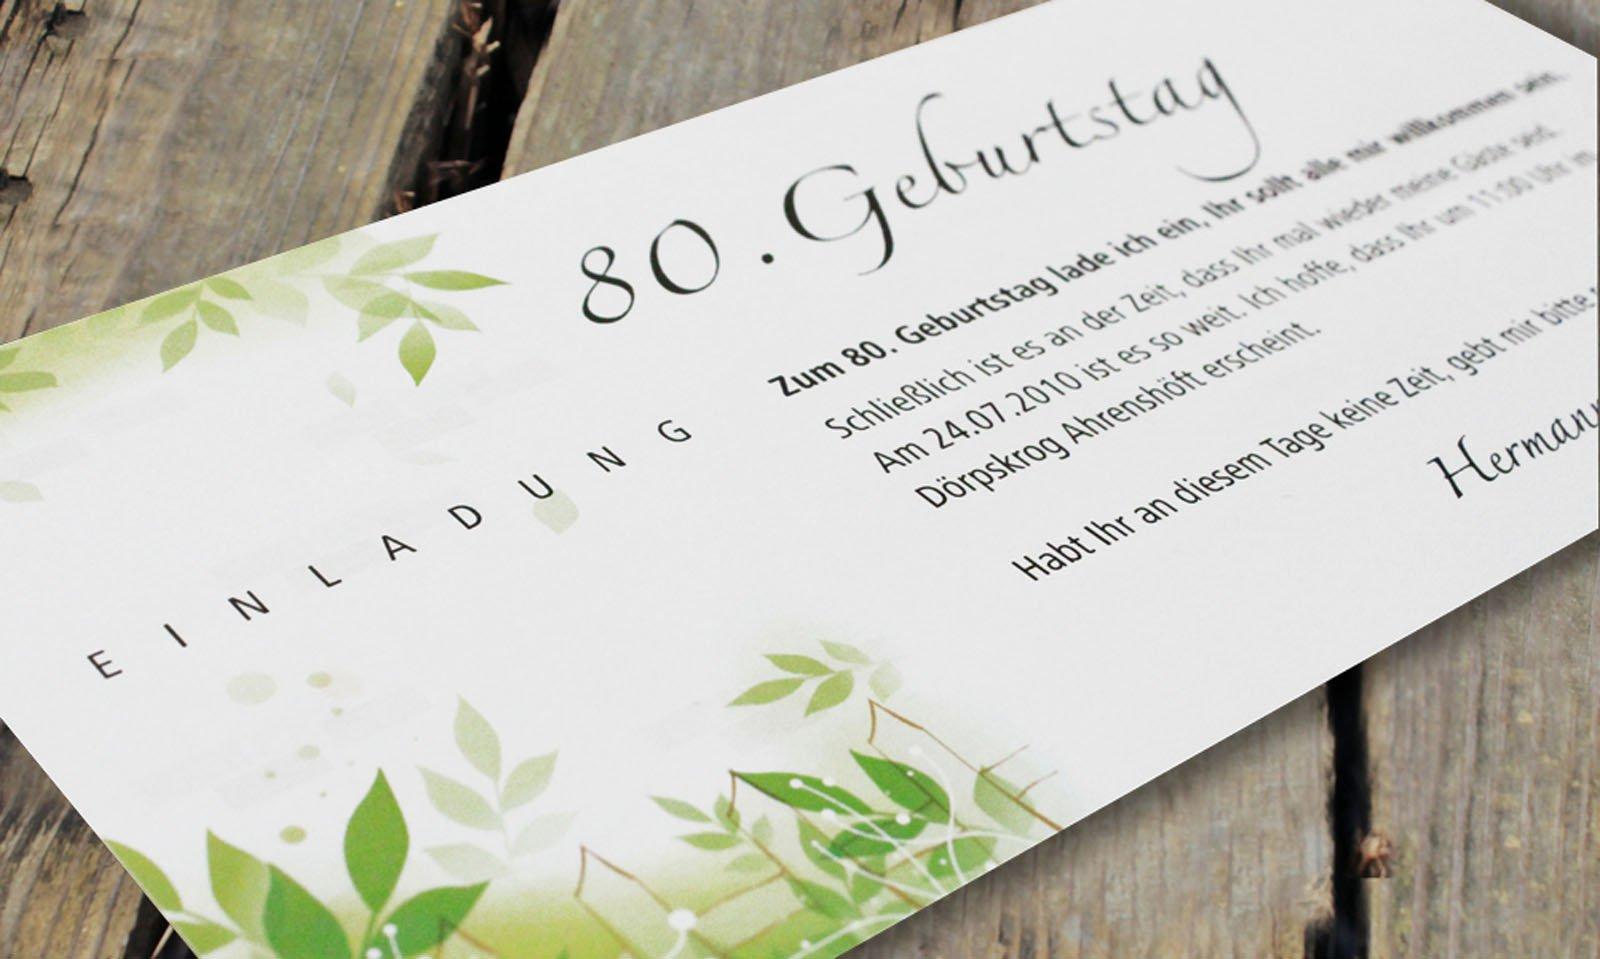 einladung 80 geburtstag : einladung 80 geburtstag gedicht